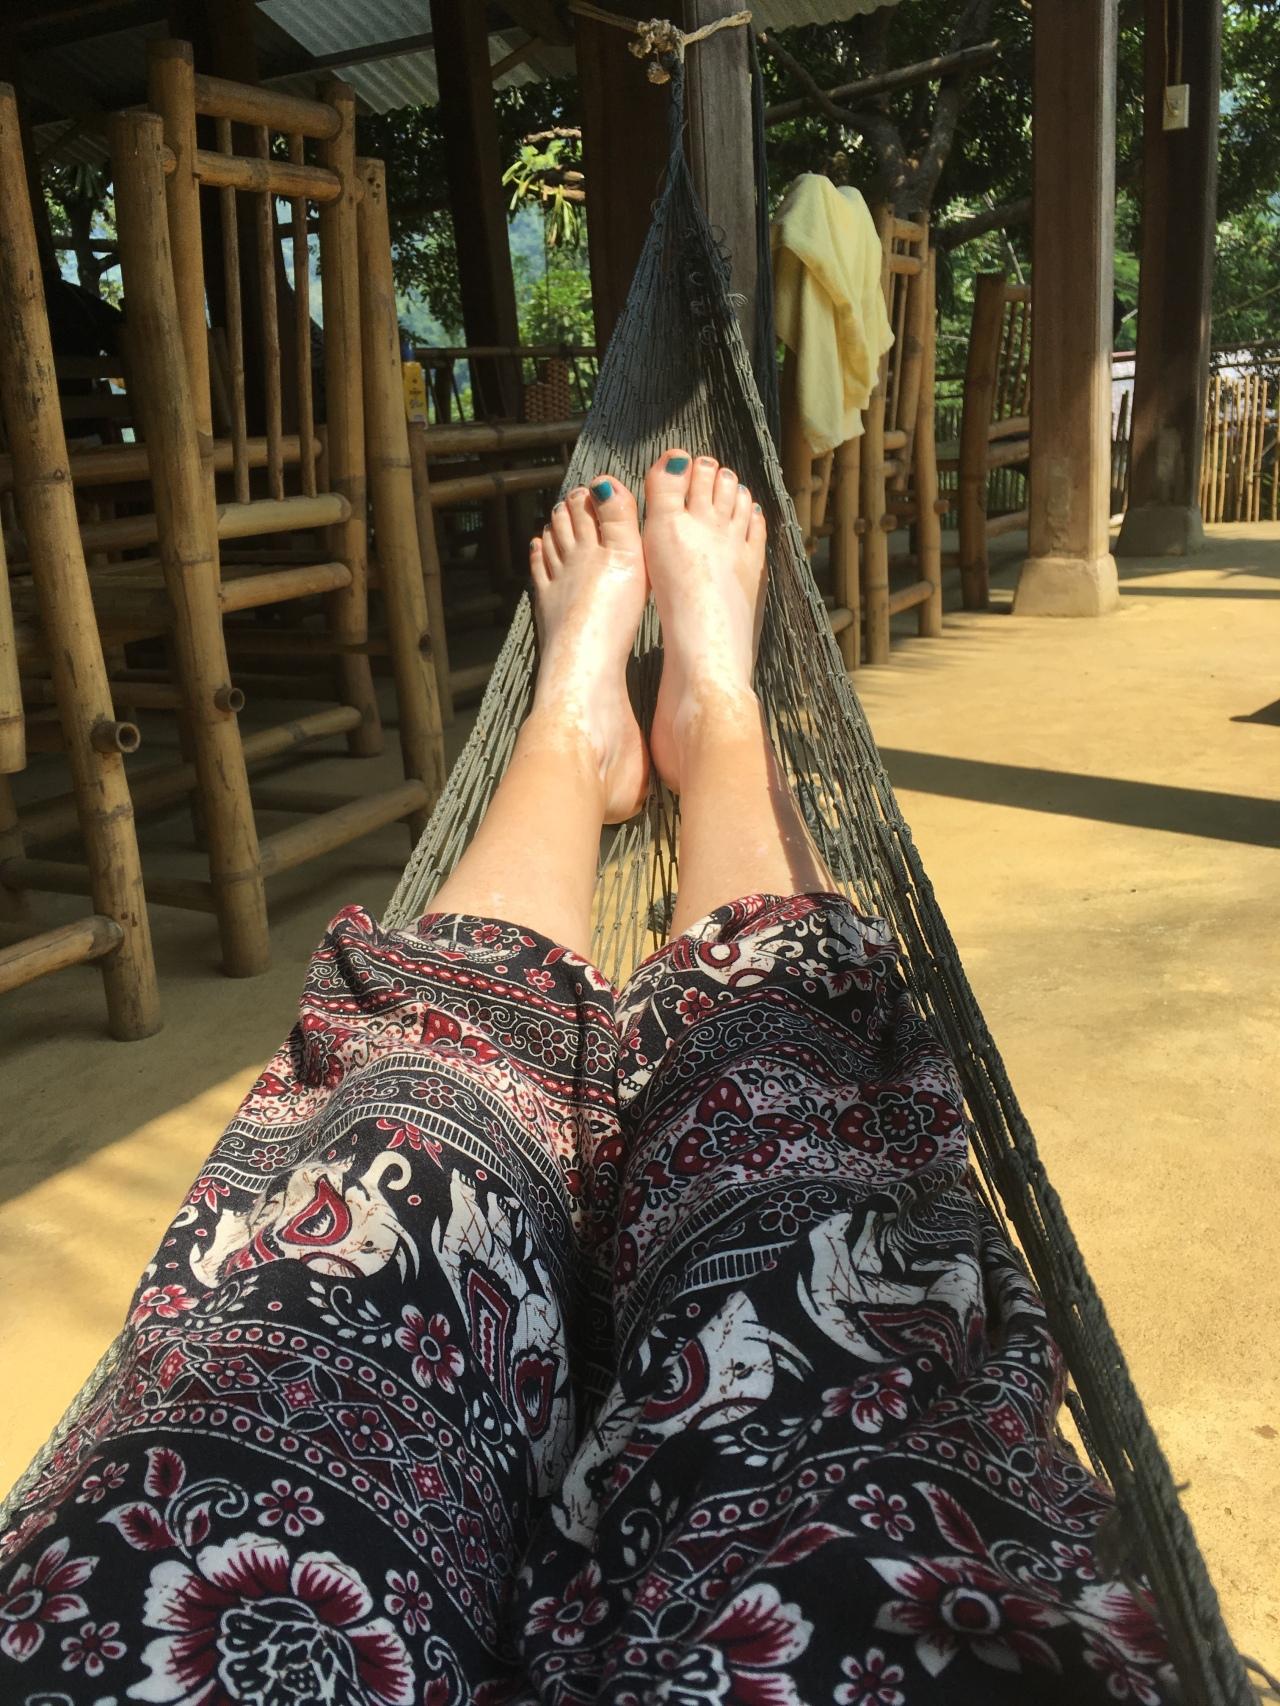 Hammock vitiligo feet